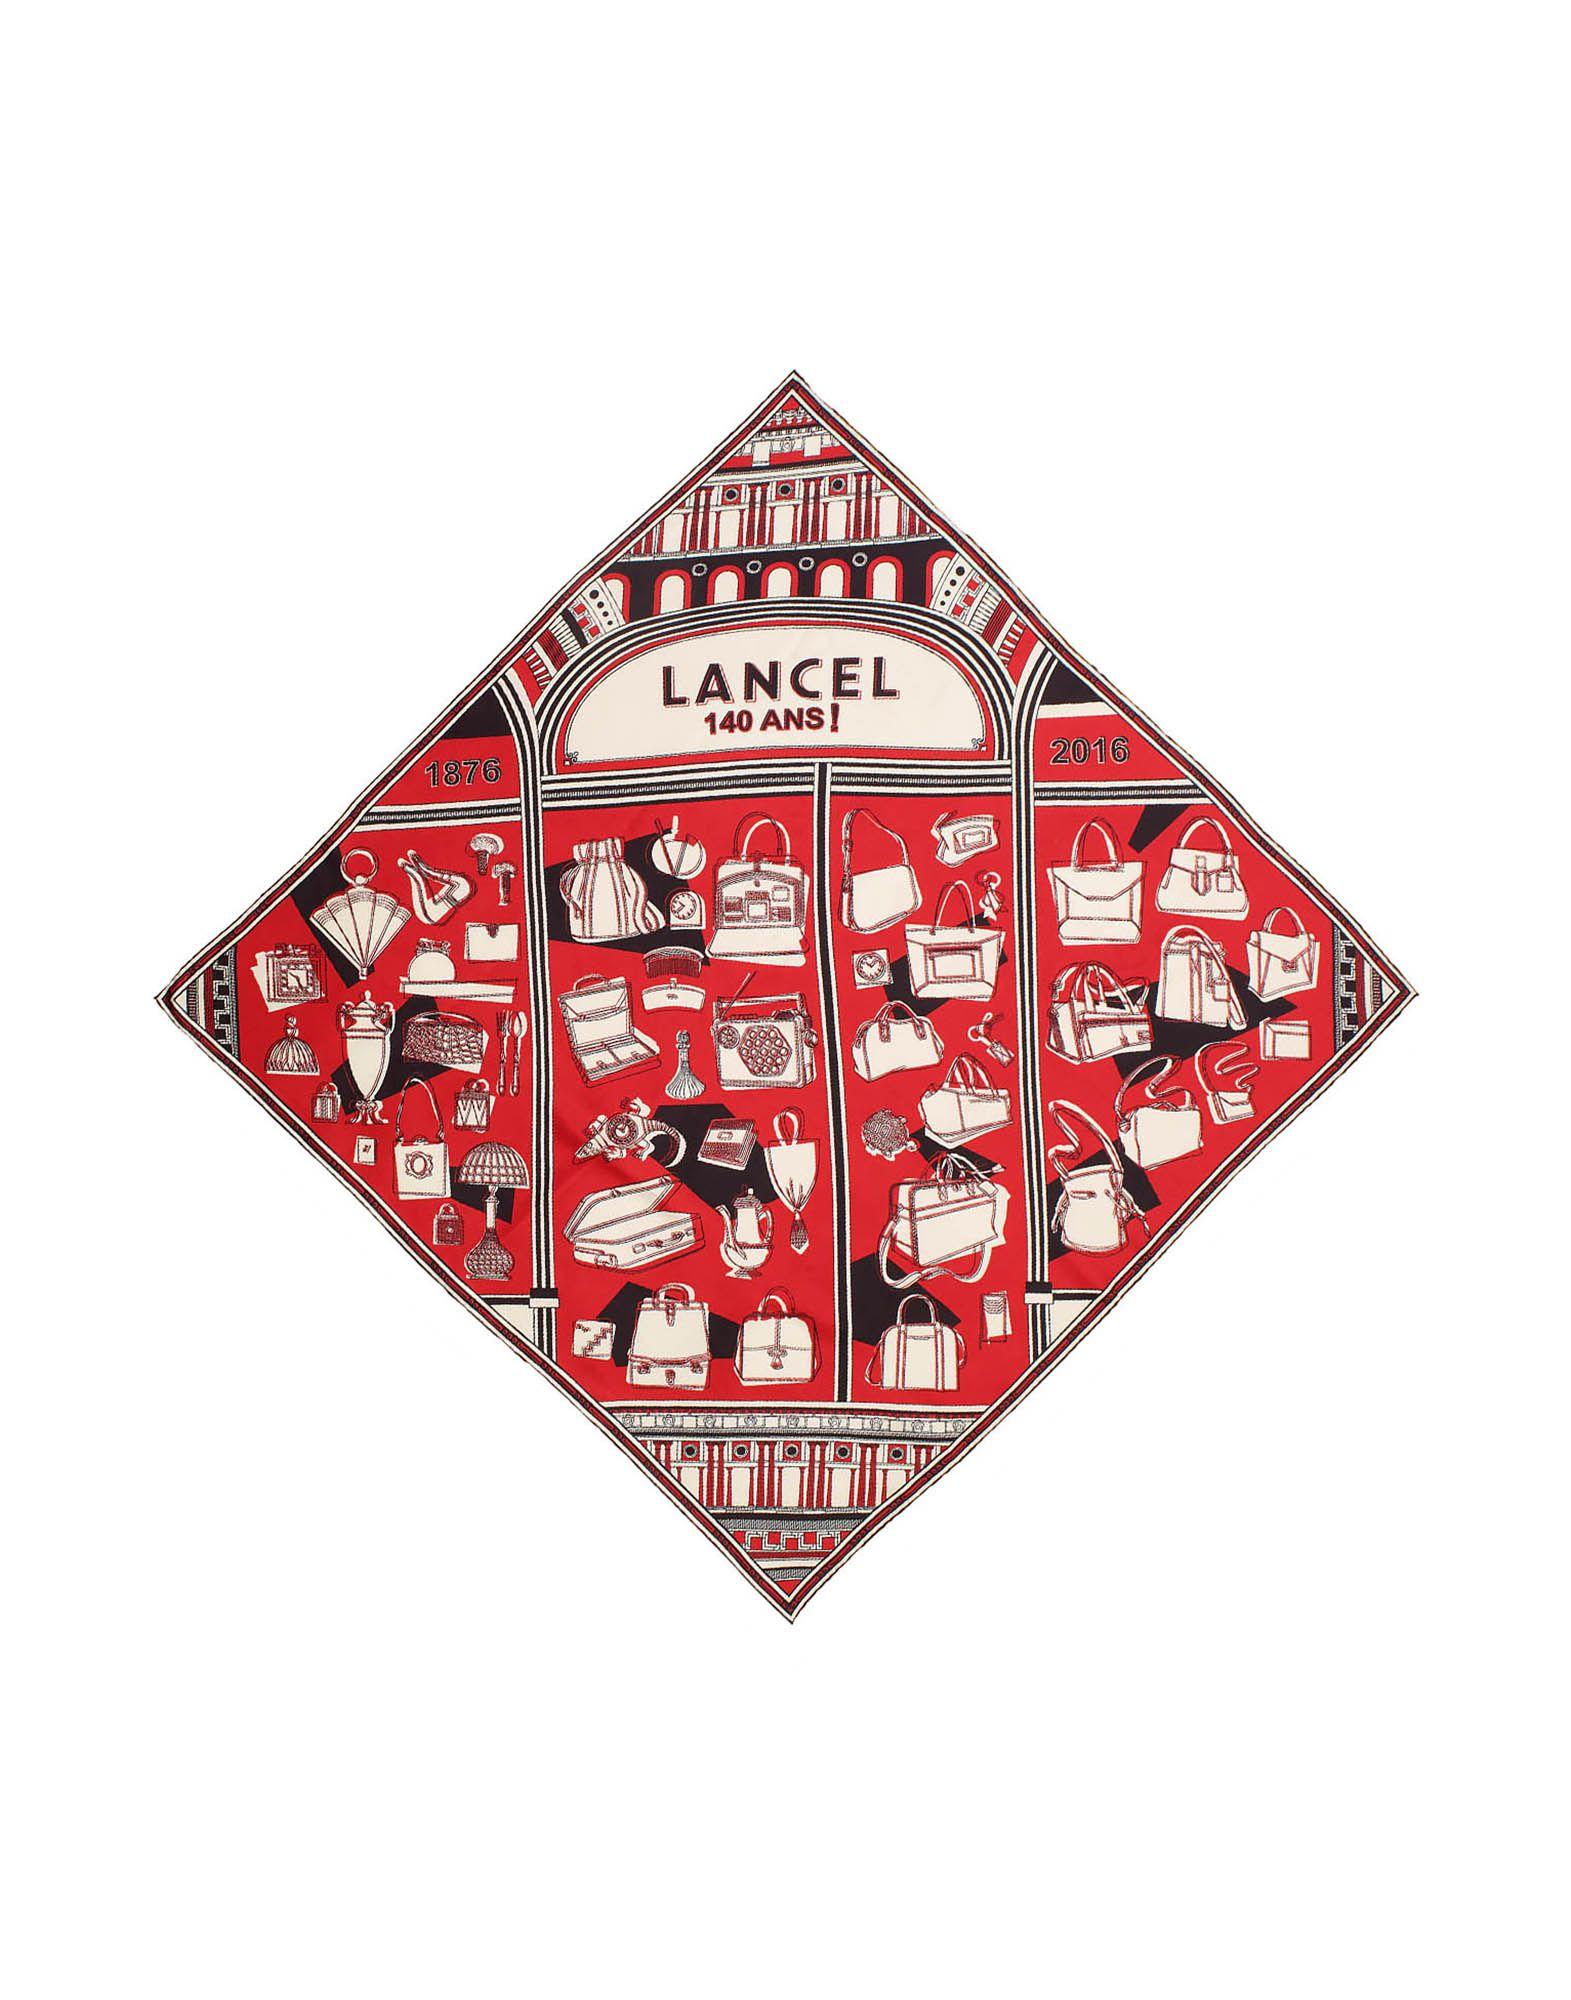 Foulard Lancel Motif 140 Ans Imprime - Donna - Acquista online su